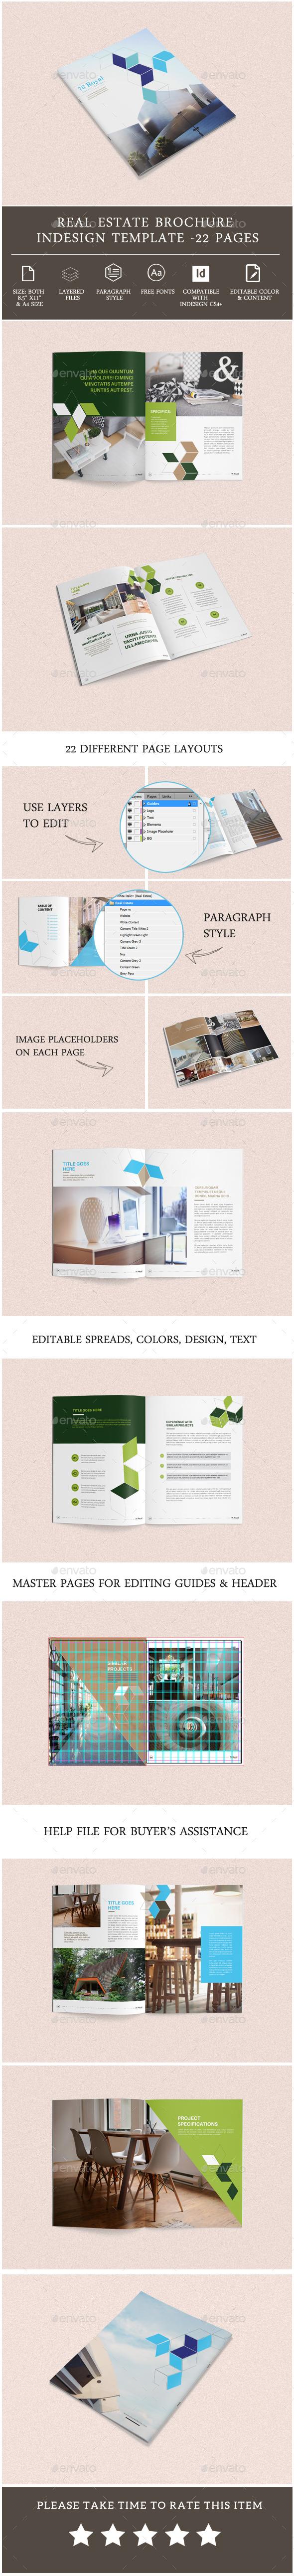 Real Estate Brochure Template - Corporate Brochures